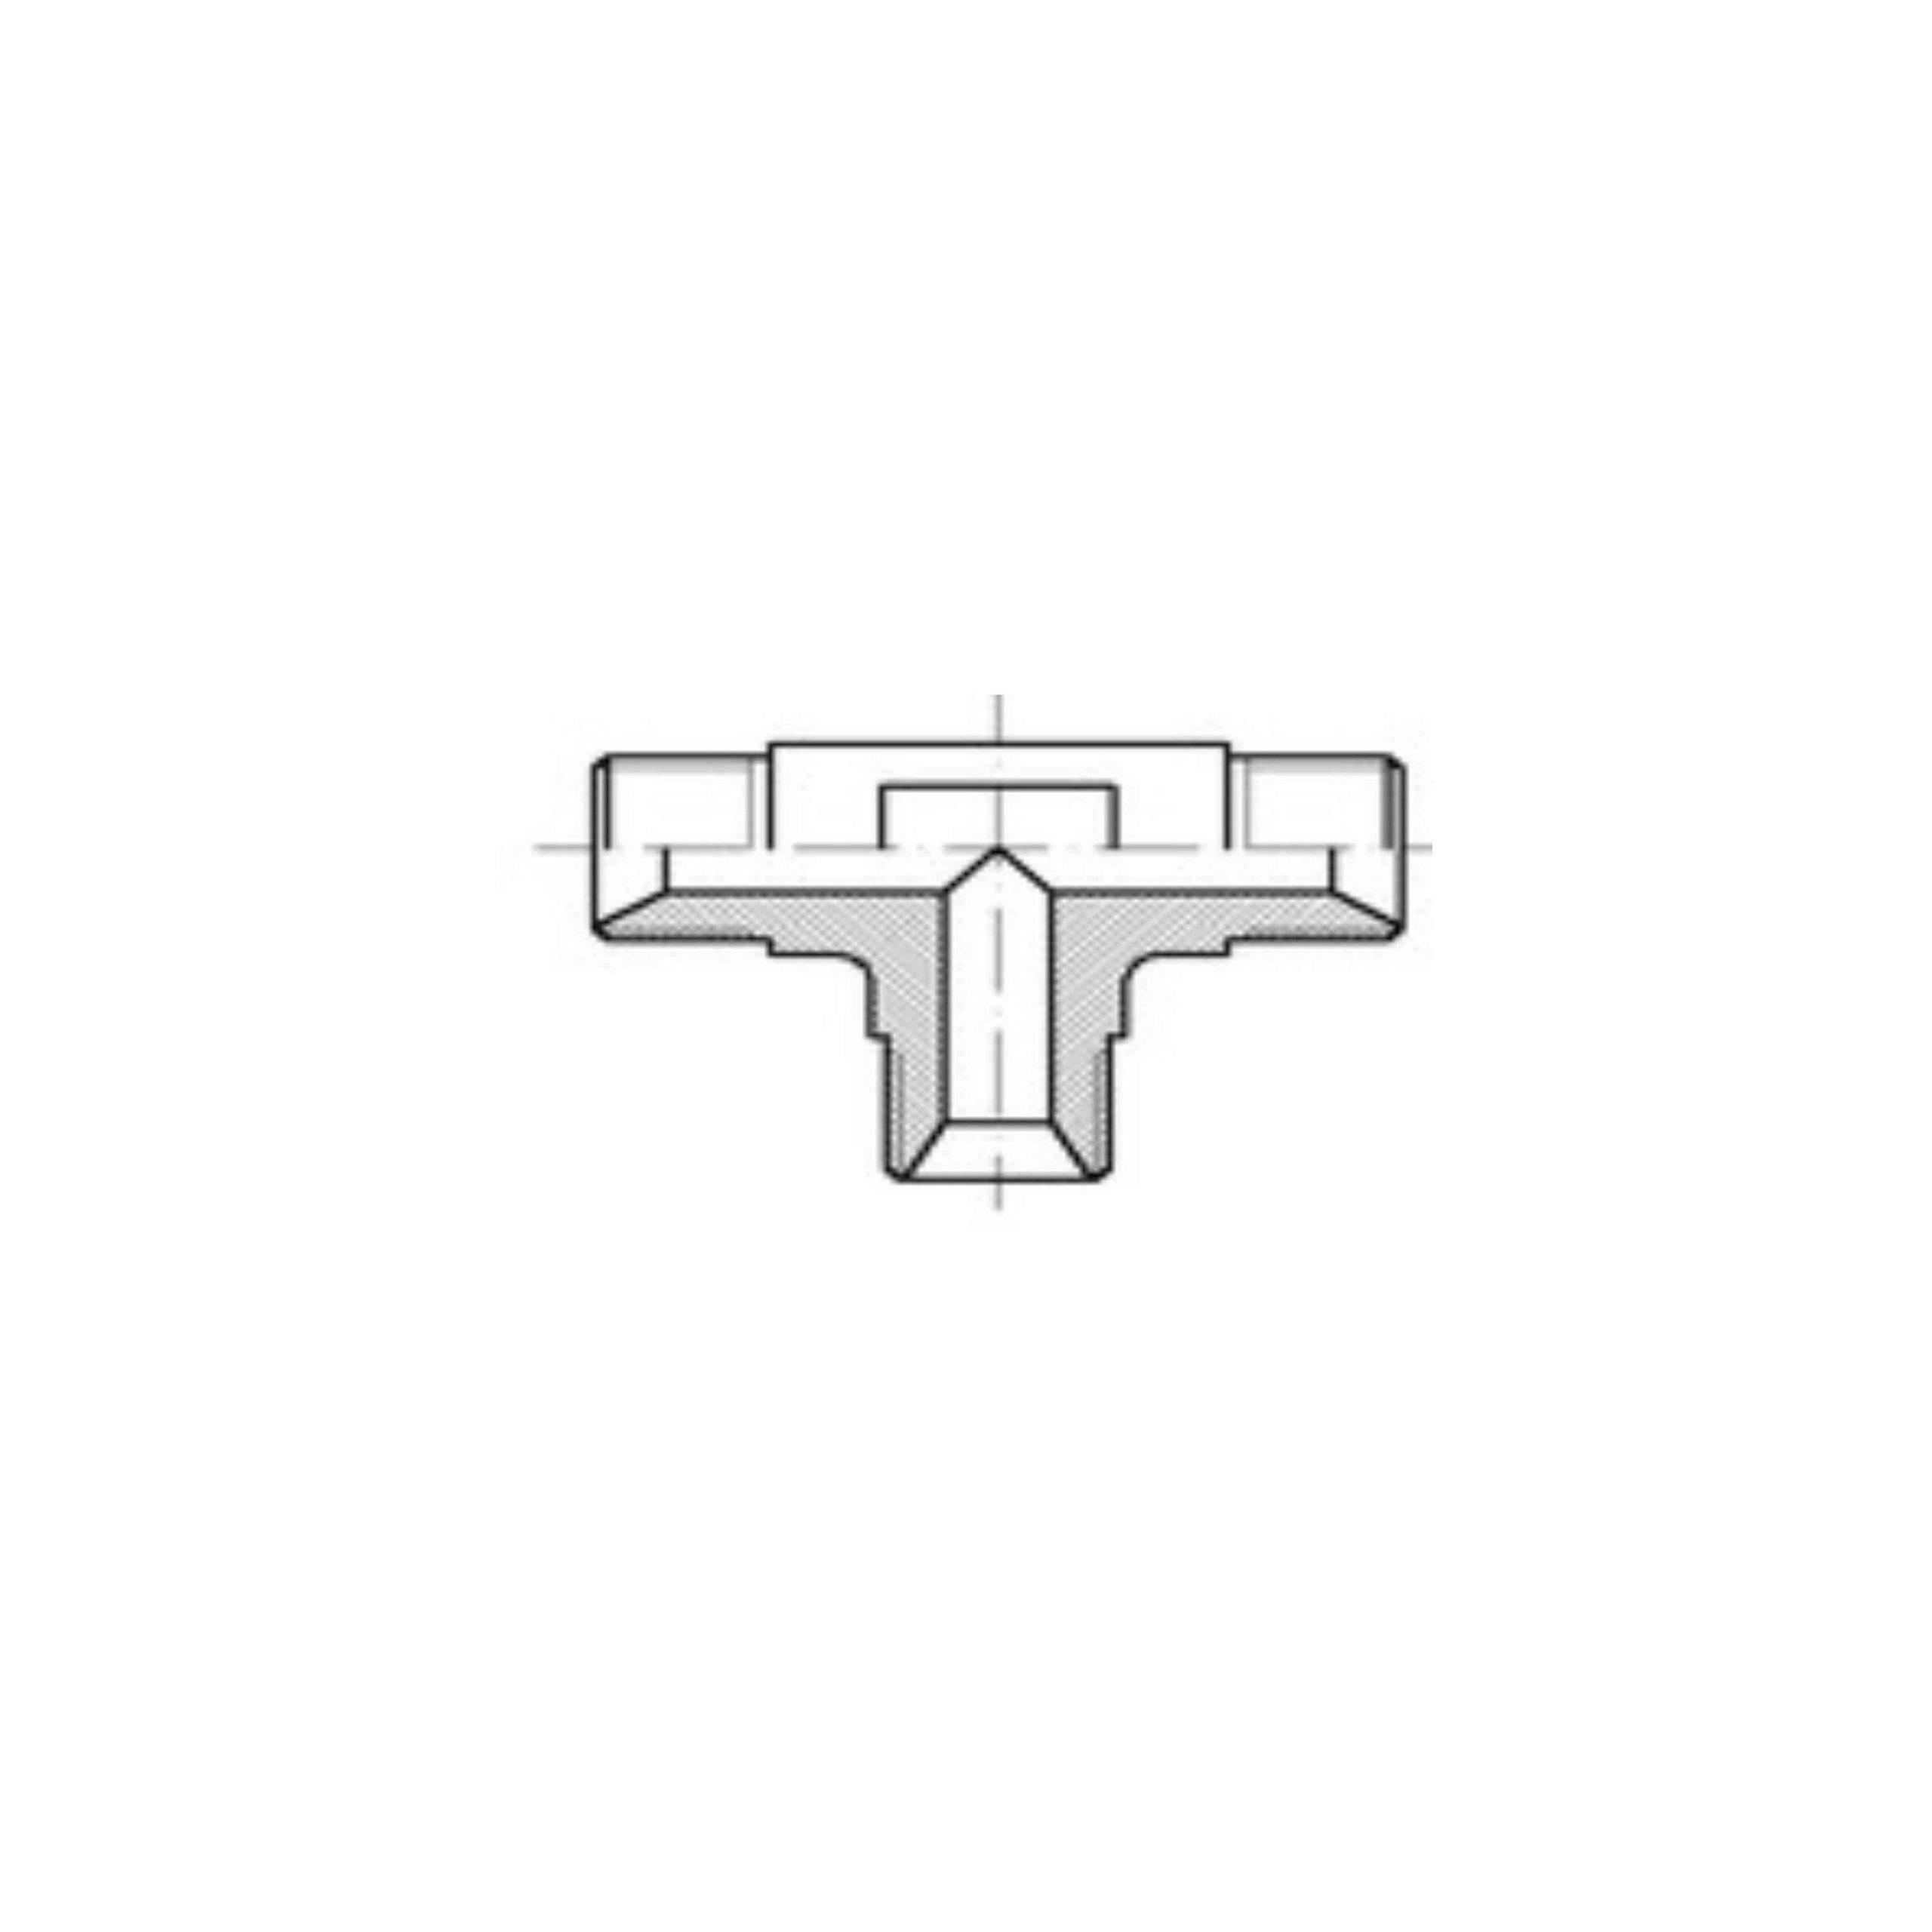 TE_EGAL_MALE_BSP_BSB_CAOUTCHOUCS_PLASTIQUES